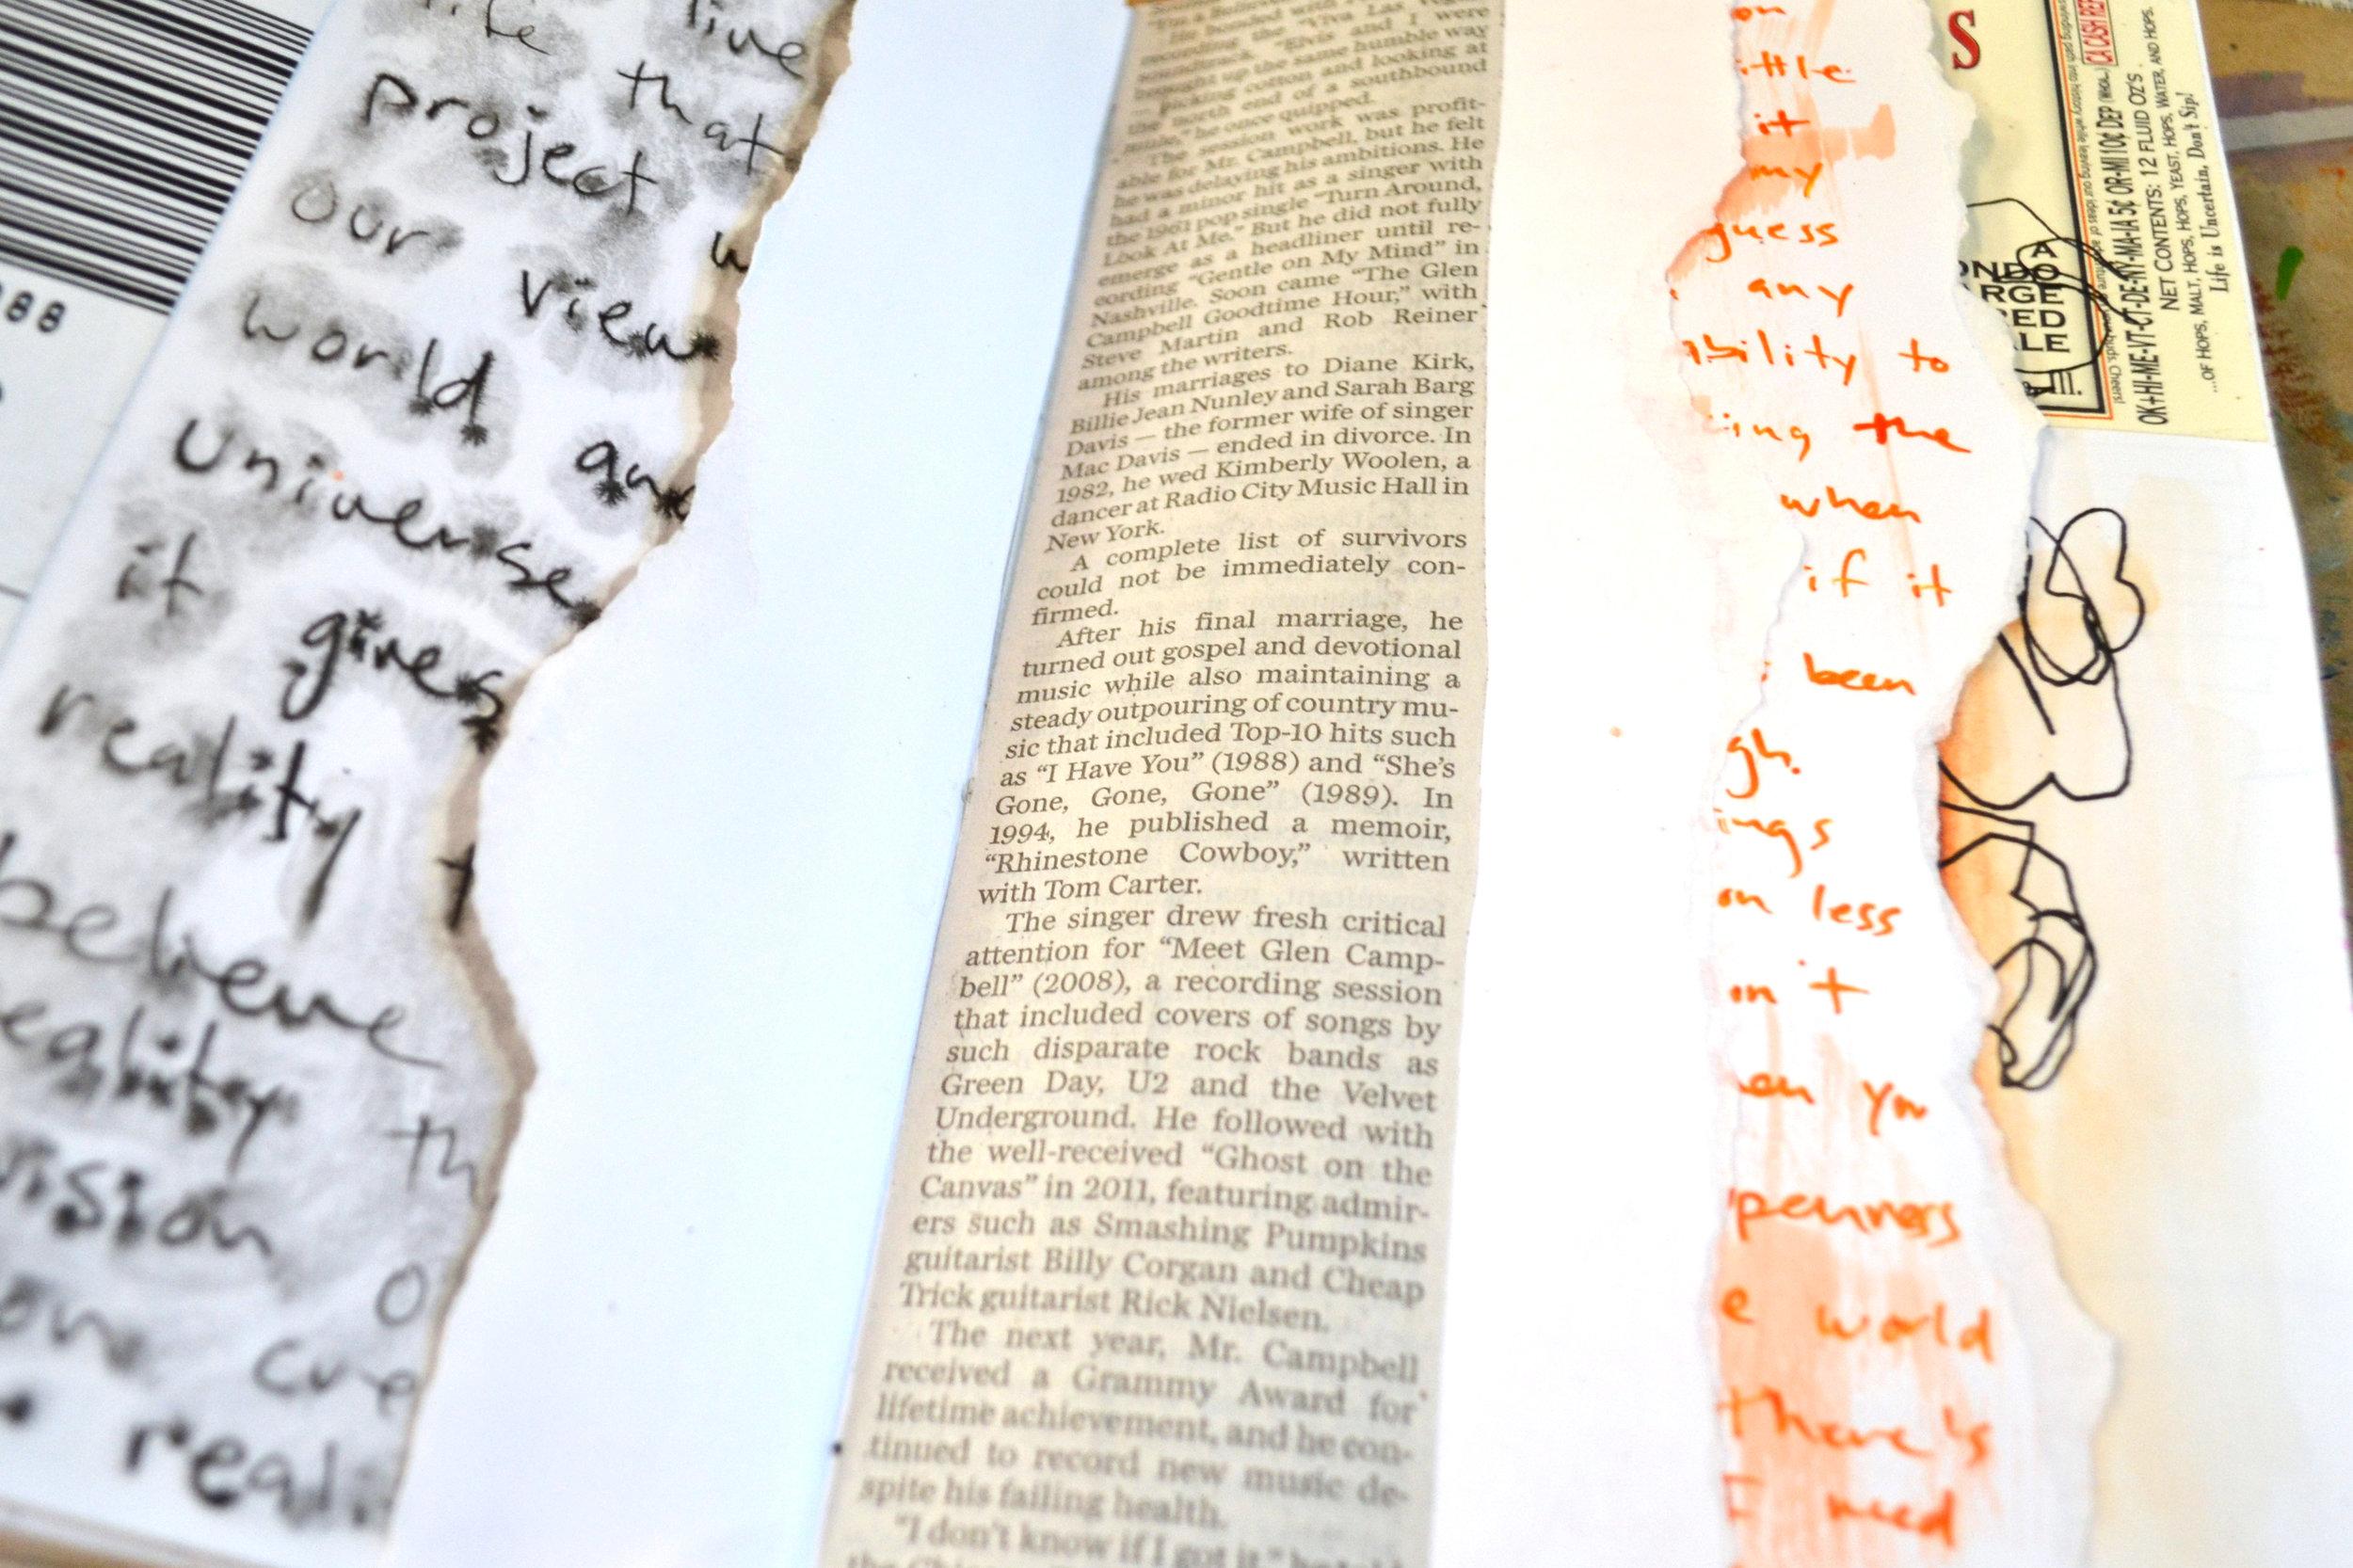 Collage: Newspaper